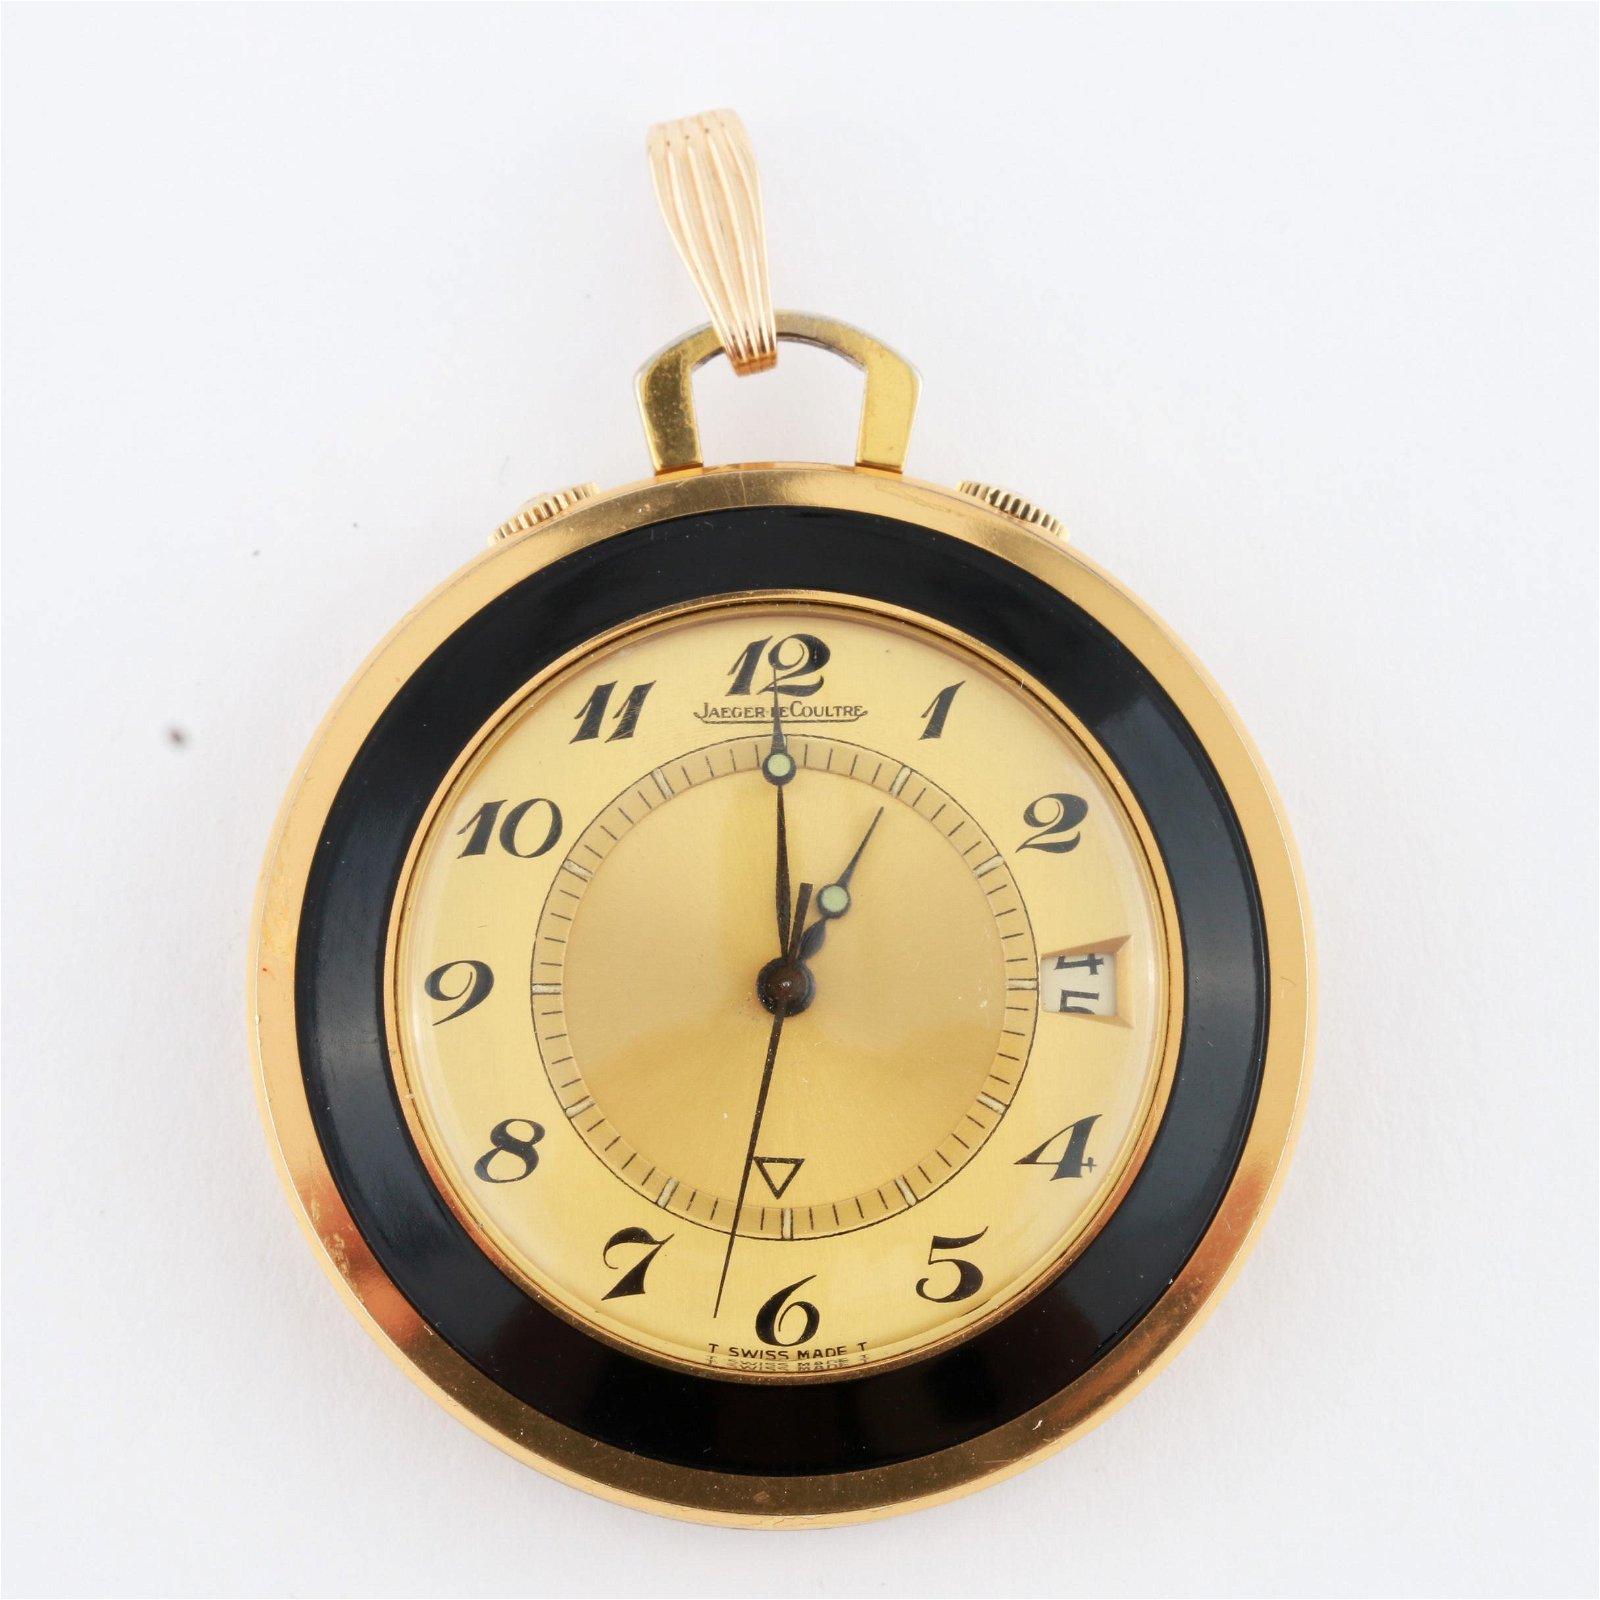 Jaeger-LeCoultre Gold Tone Traveling Alarm Clock